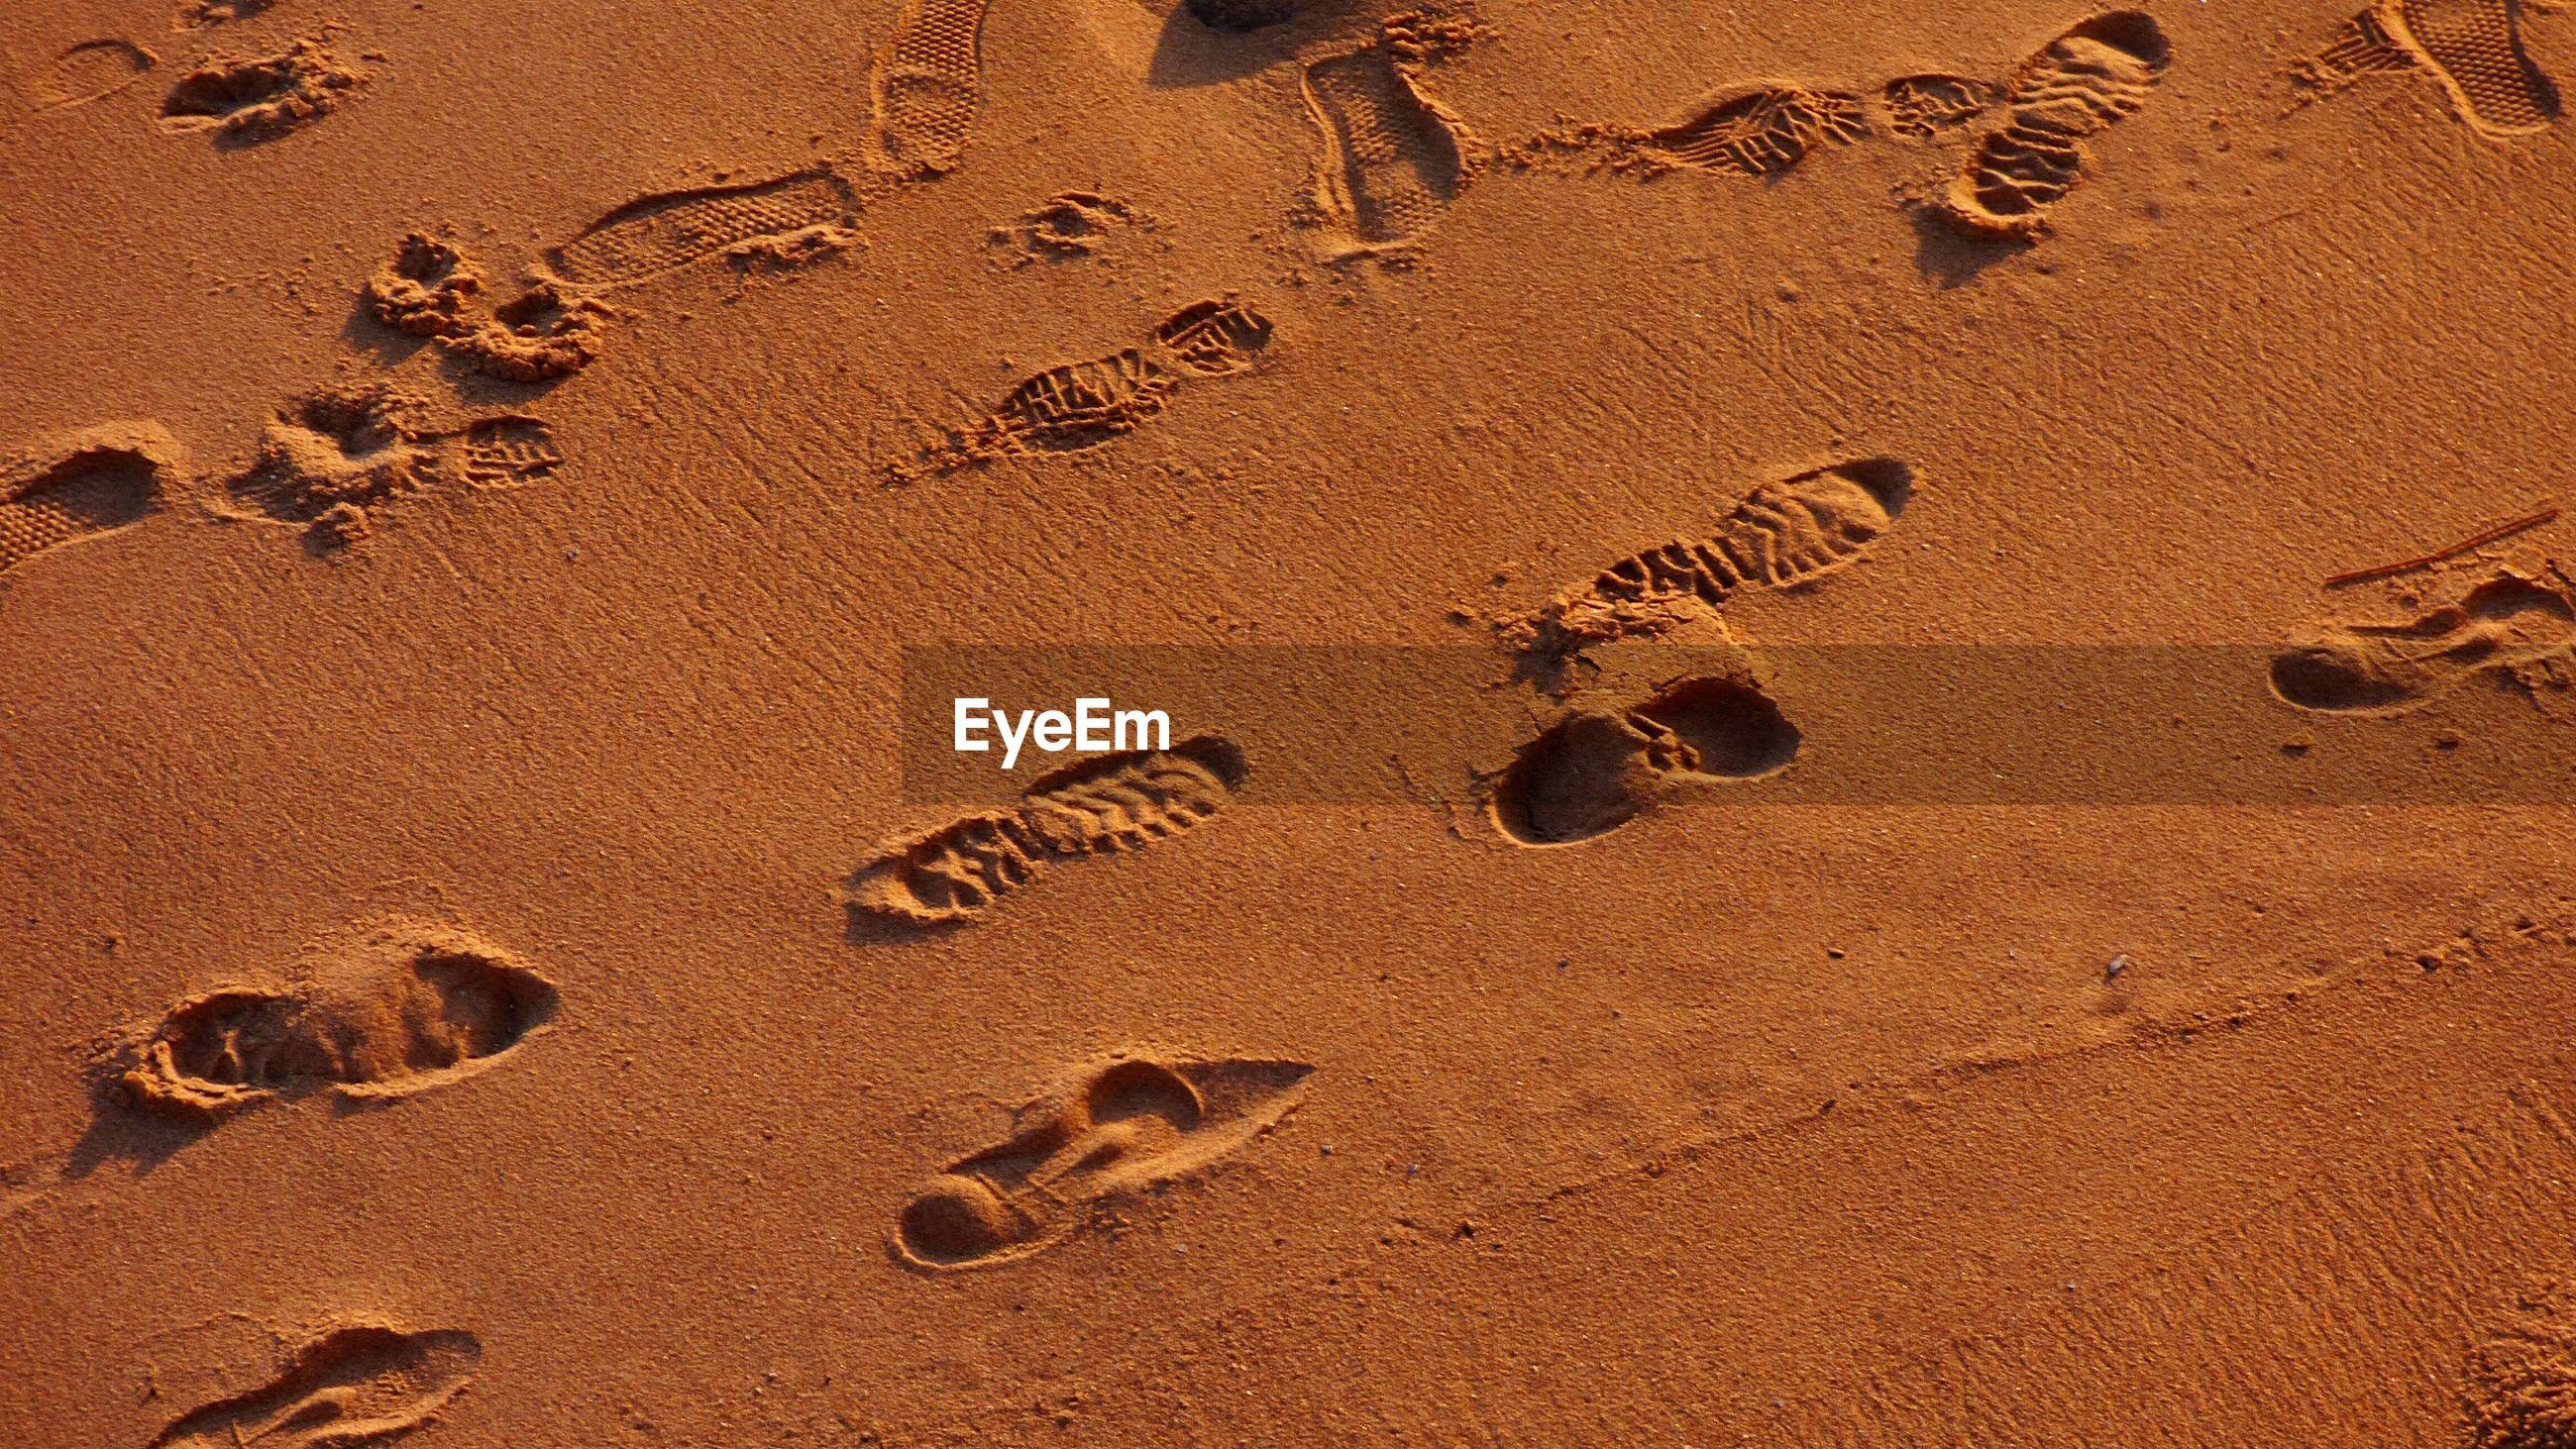 Footprints on sandy beach